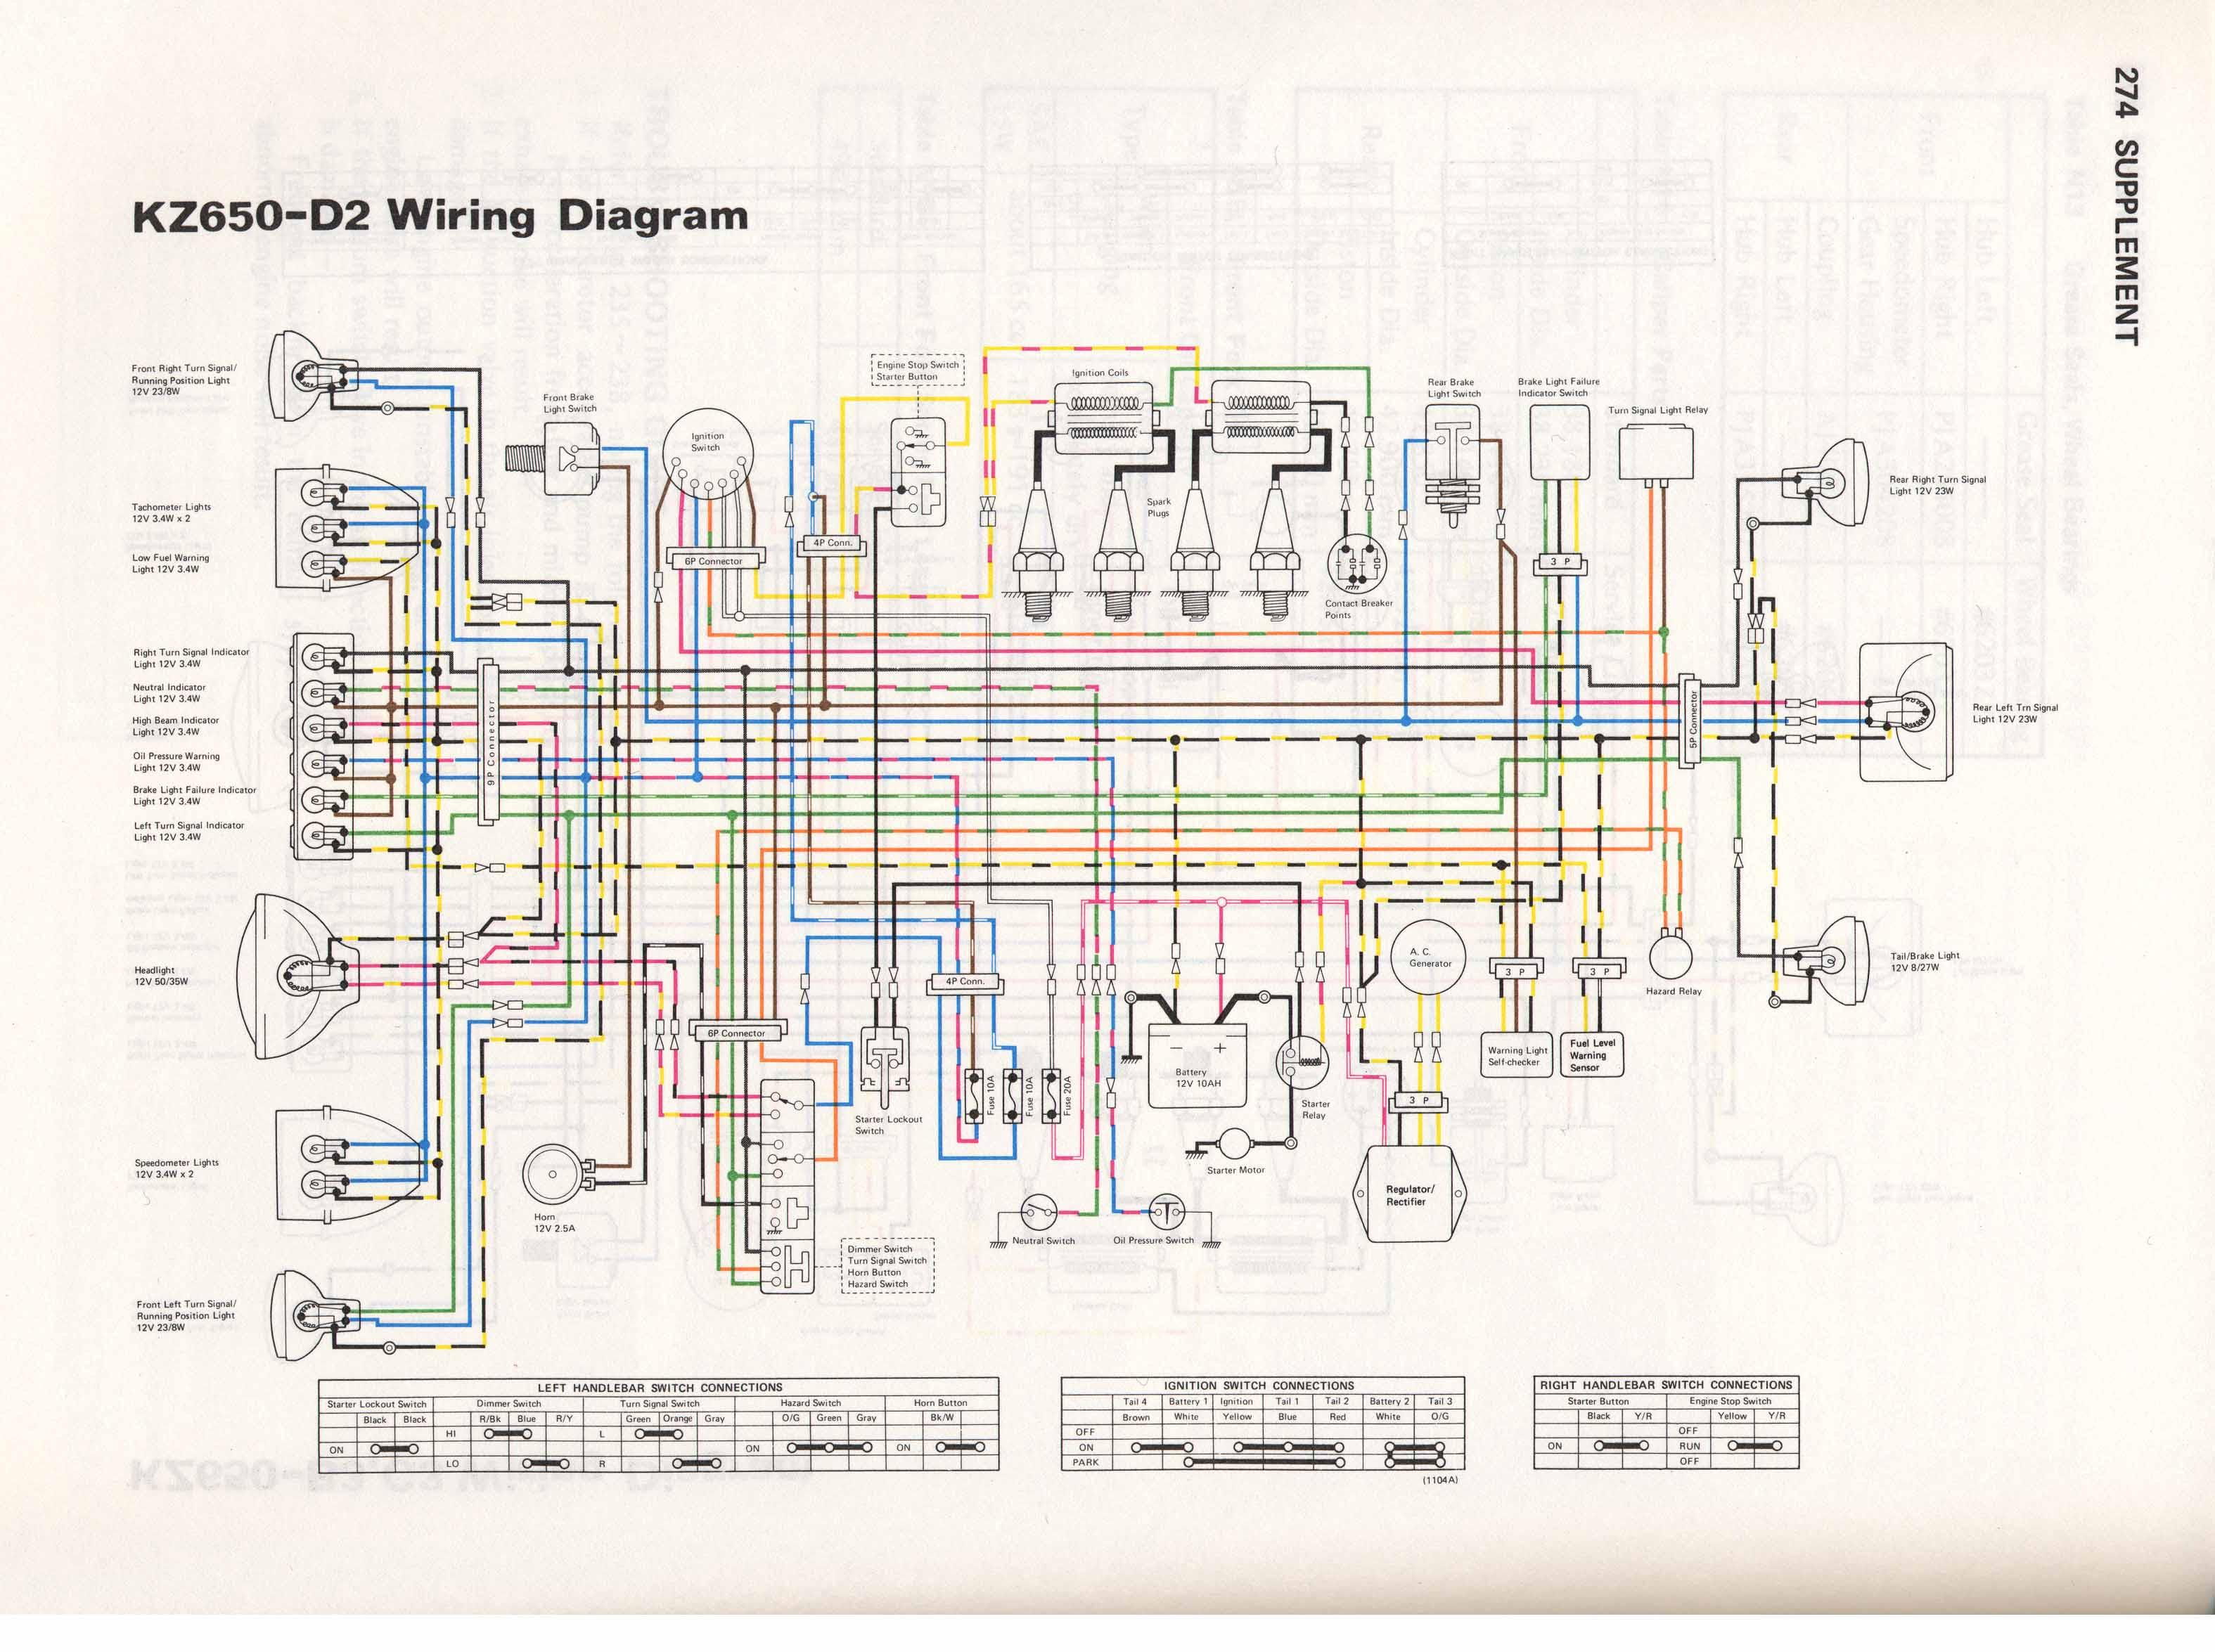 D3f49 2000 Yfz 450 Wiring Diagram Free Download Wiring Resources